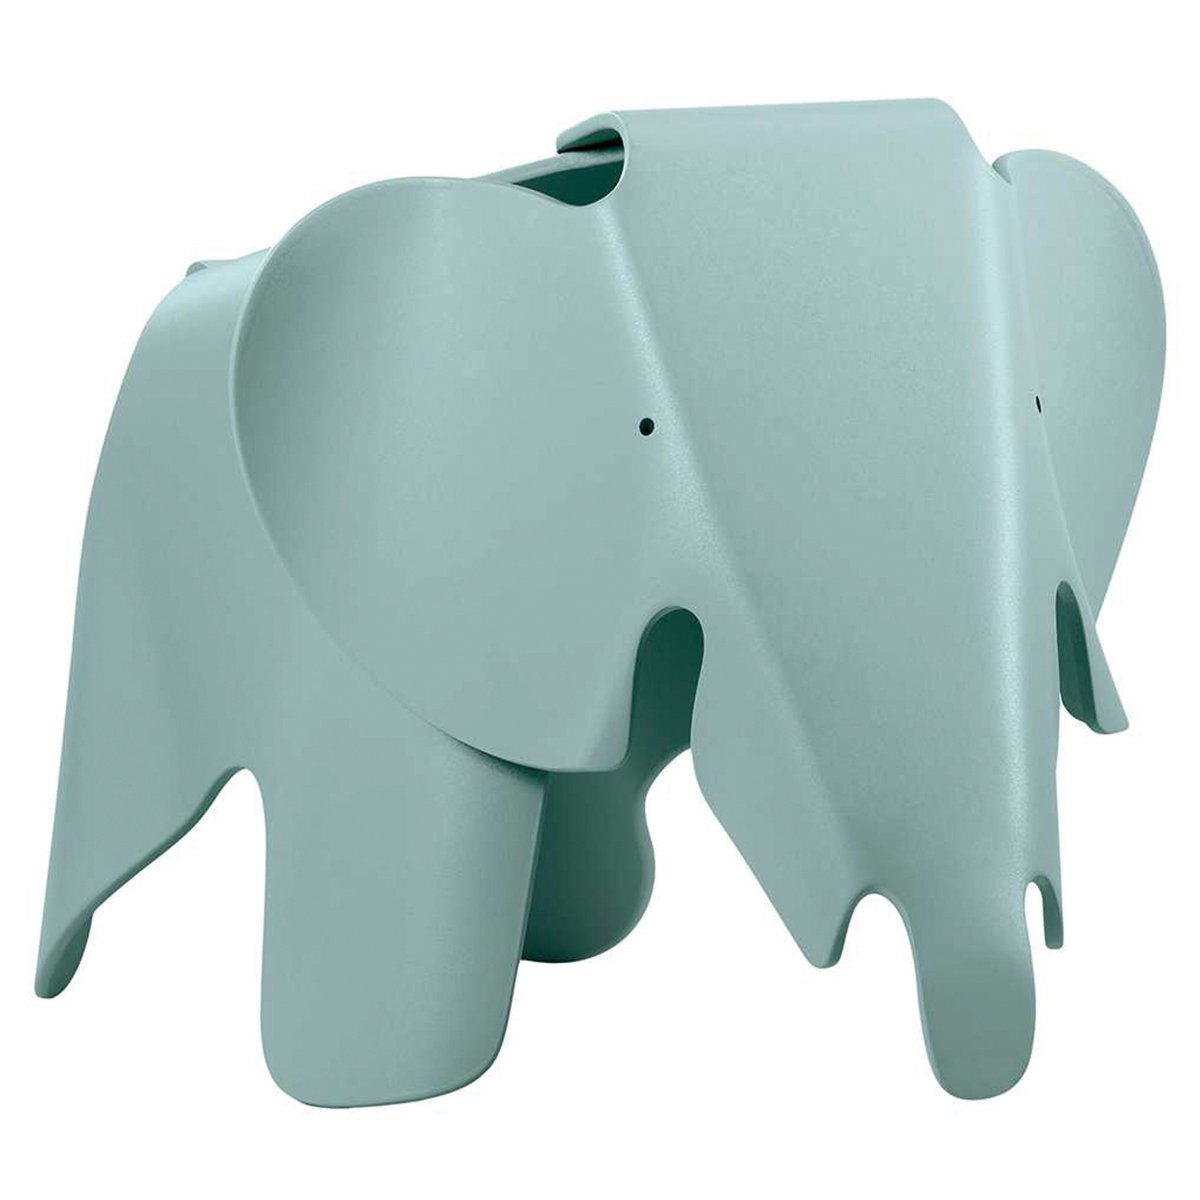 Vitra Elephant Kinderstoel IJsgrijs